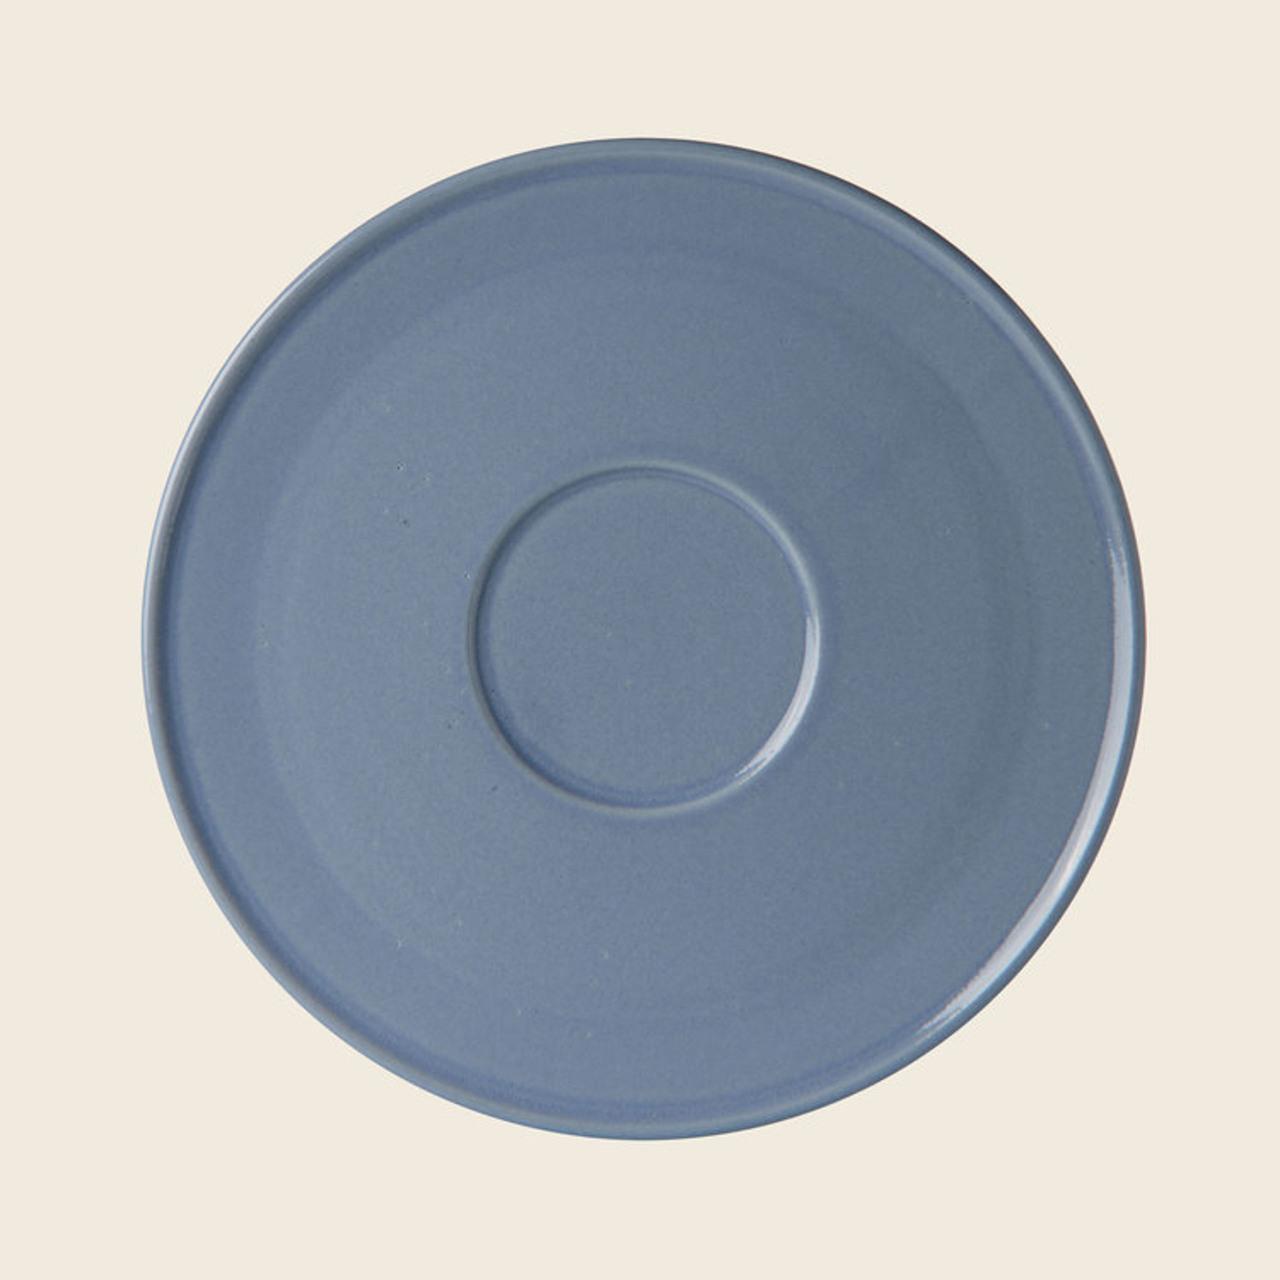 Schneid Plate Keramik, Blaugrau